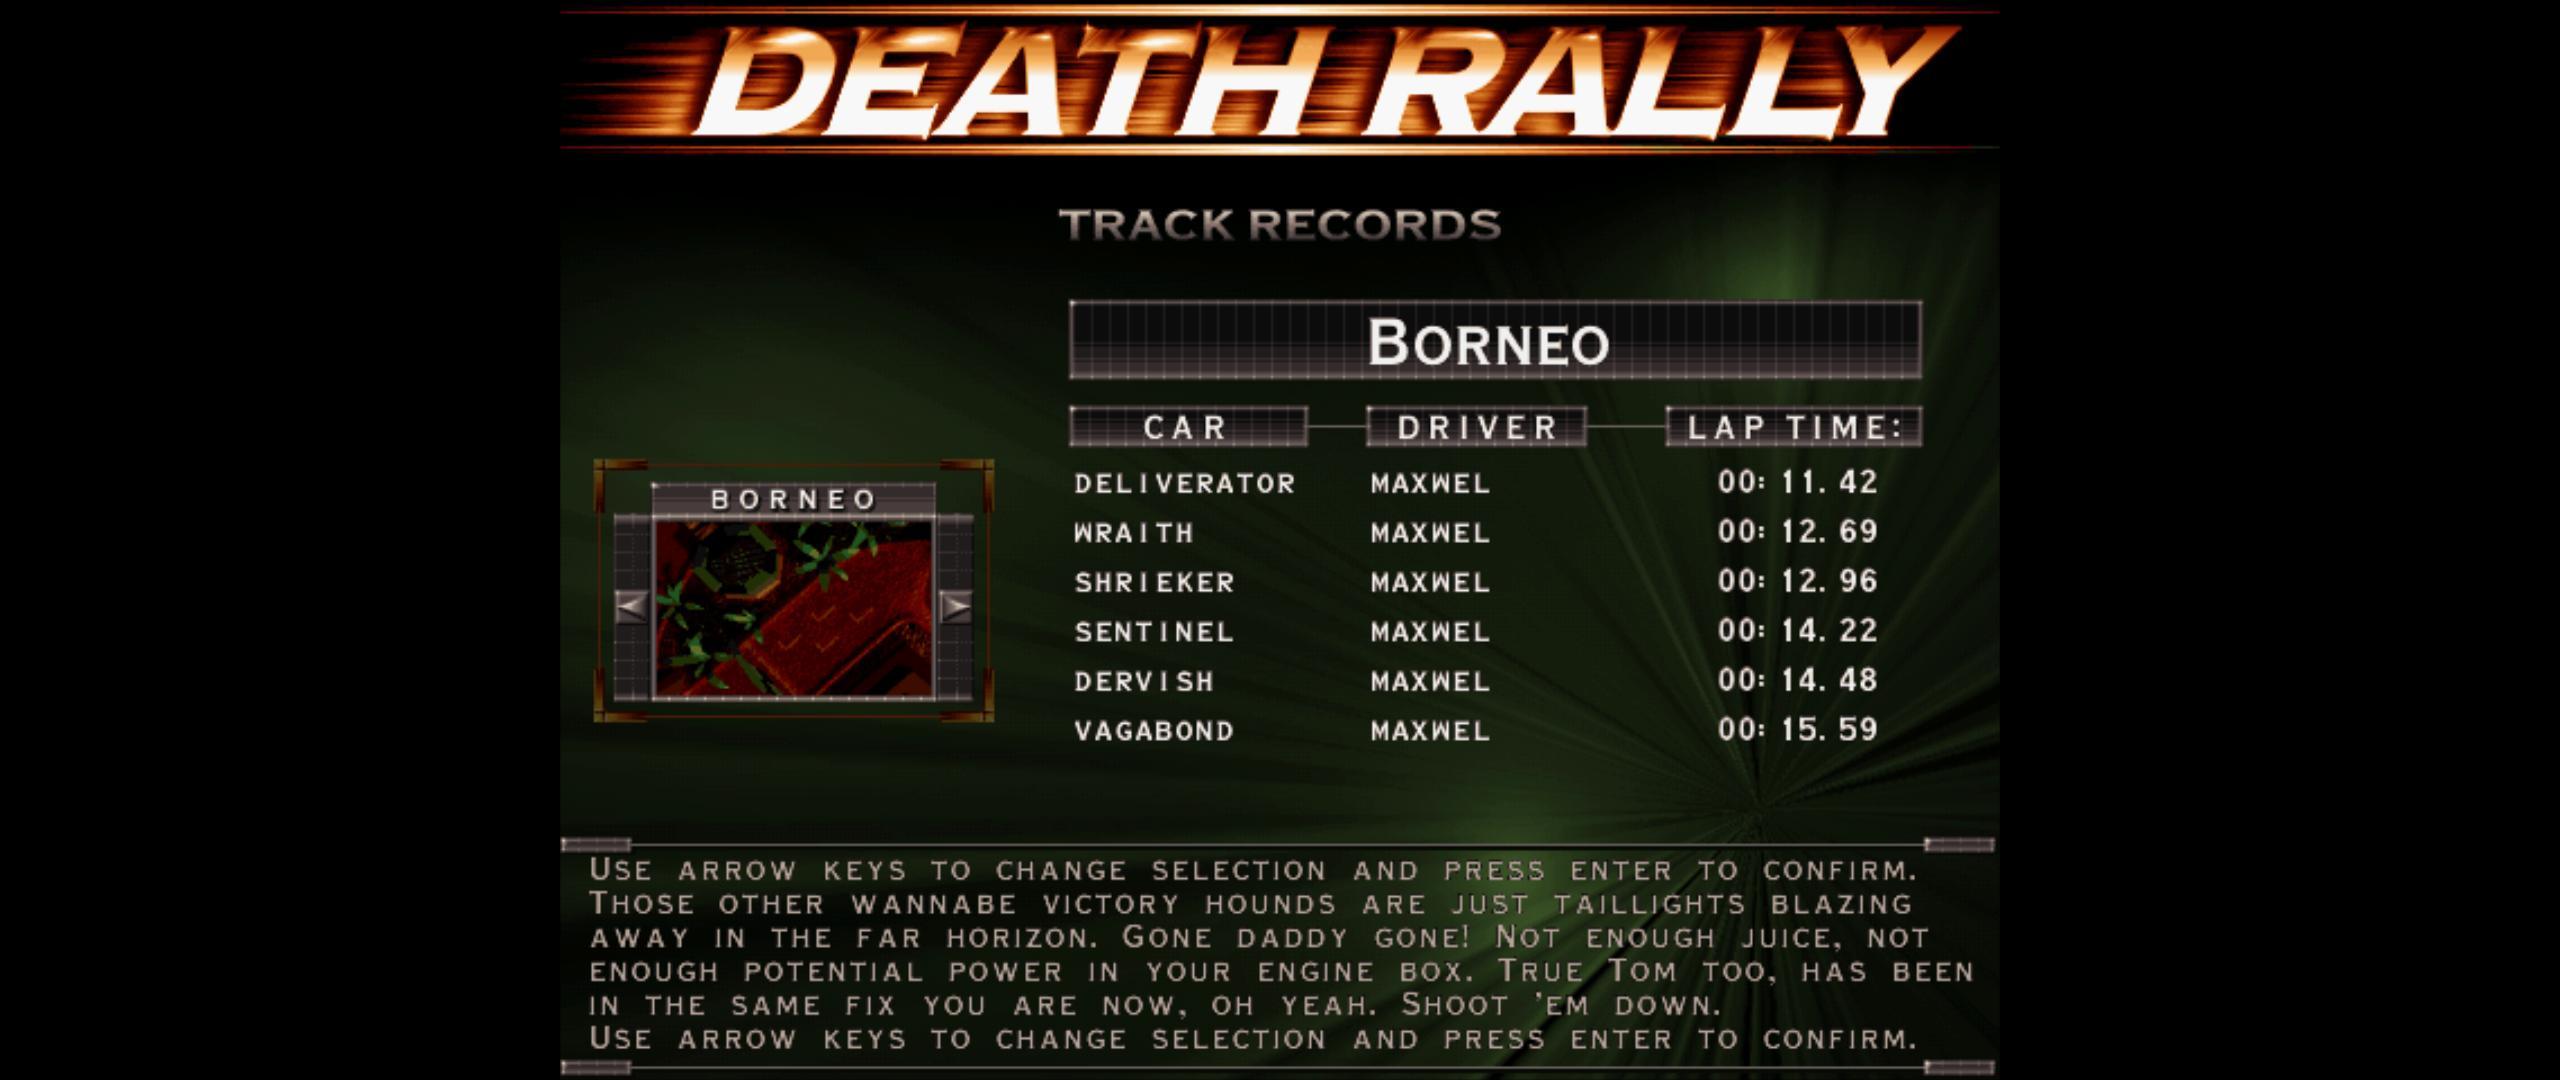 Maxwel: Death Rally [Borneo, Shrieker Car] (PC) 0:00:12.96 points on 2016-03-04 07:55:15